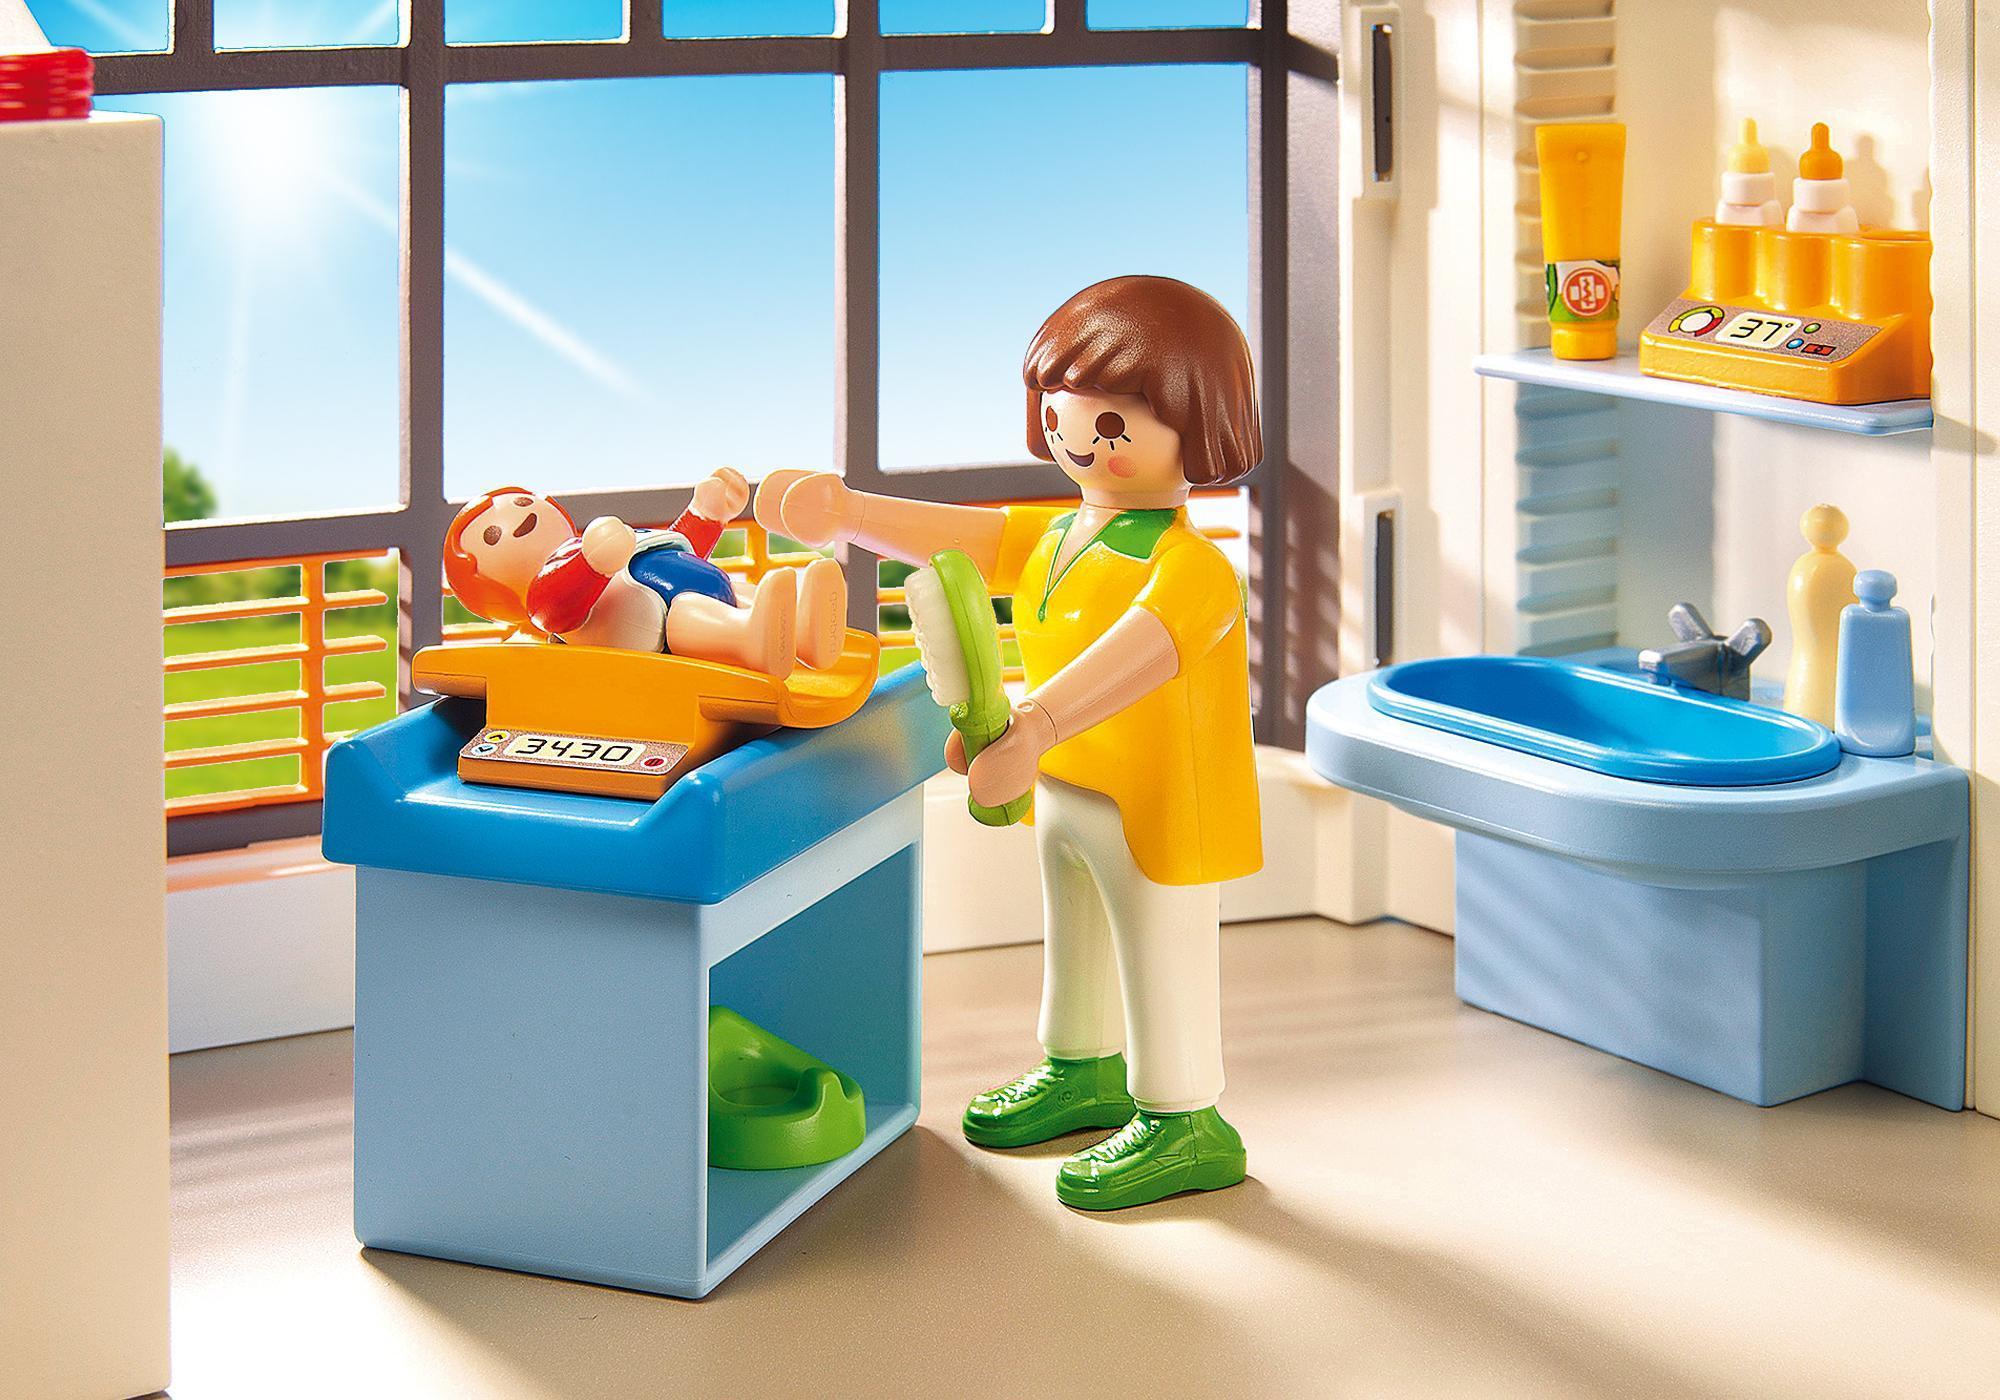 http://media.playmobil.com/i/playmobil/6657_product_extra3/Hôpital pédiatrique aménagé